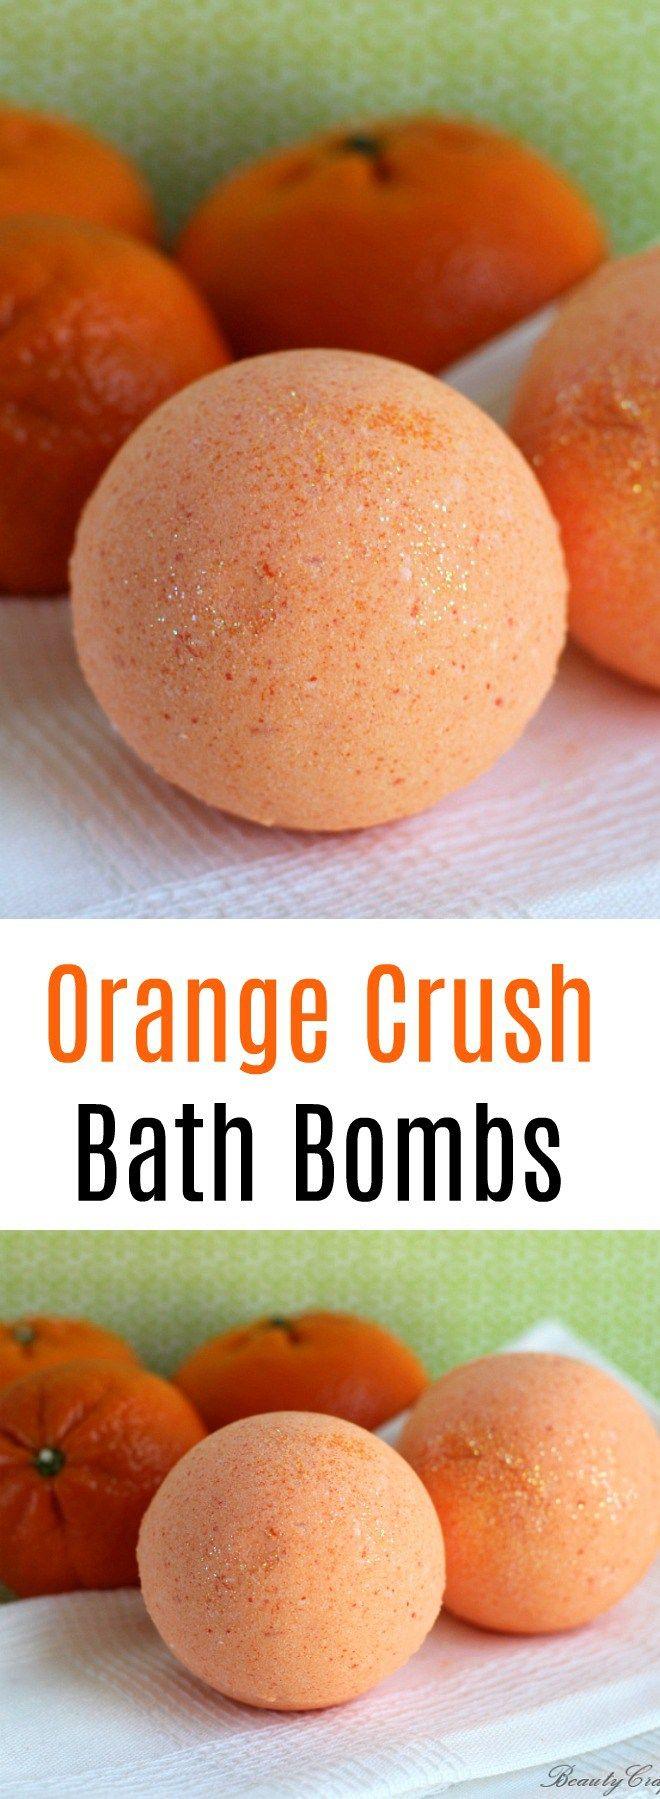 DIY Orange Bath Bombs recipe ... uplifting therapeutic bath bombs. #bathbombs #orange #diy #crafts